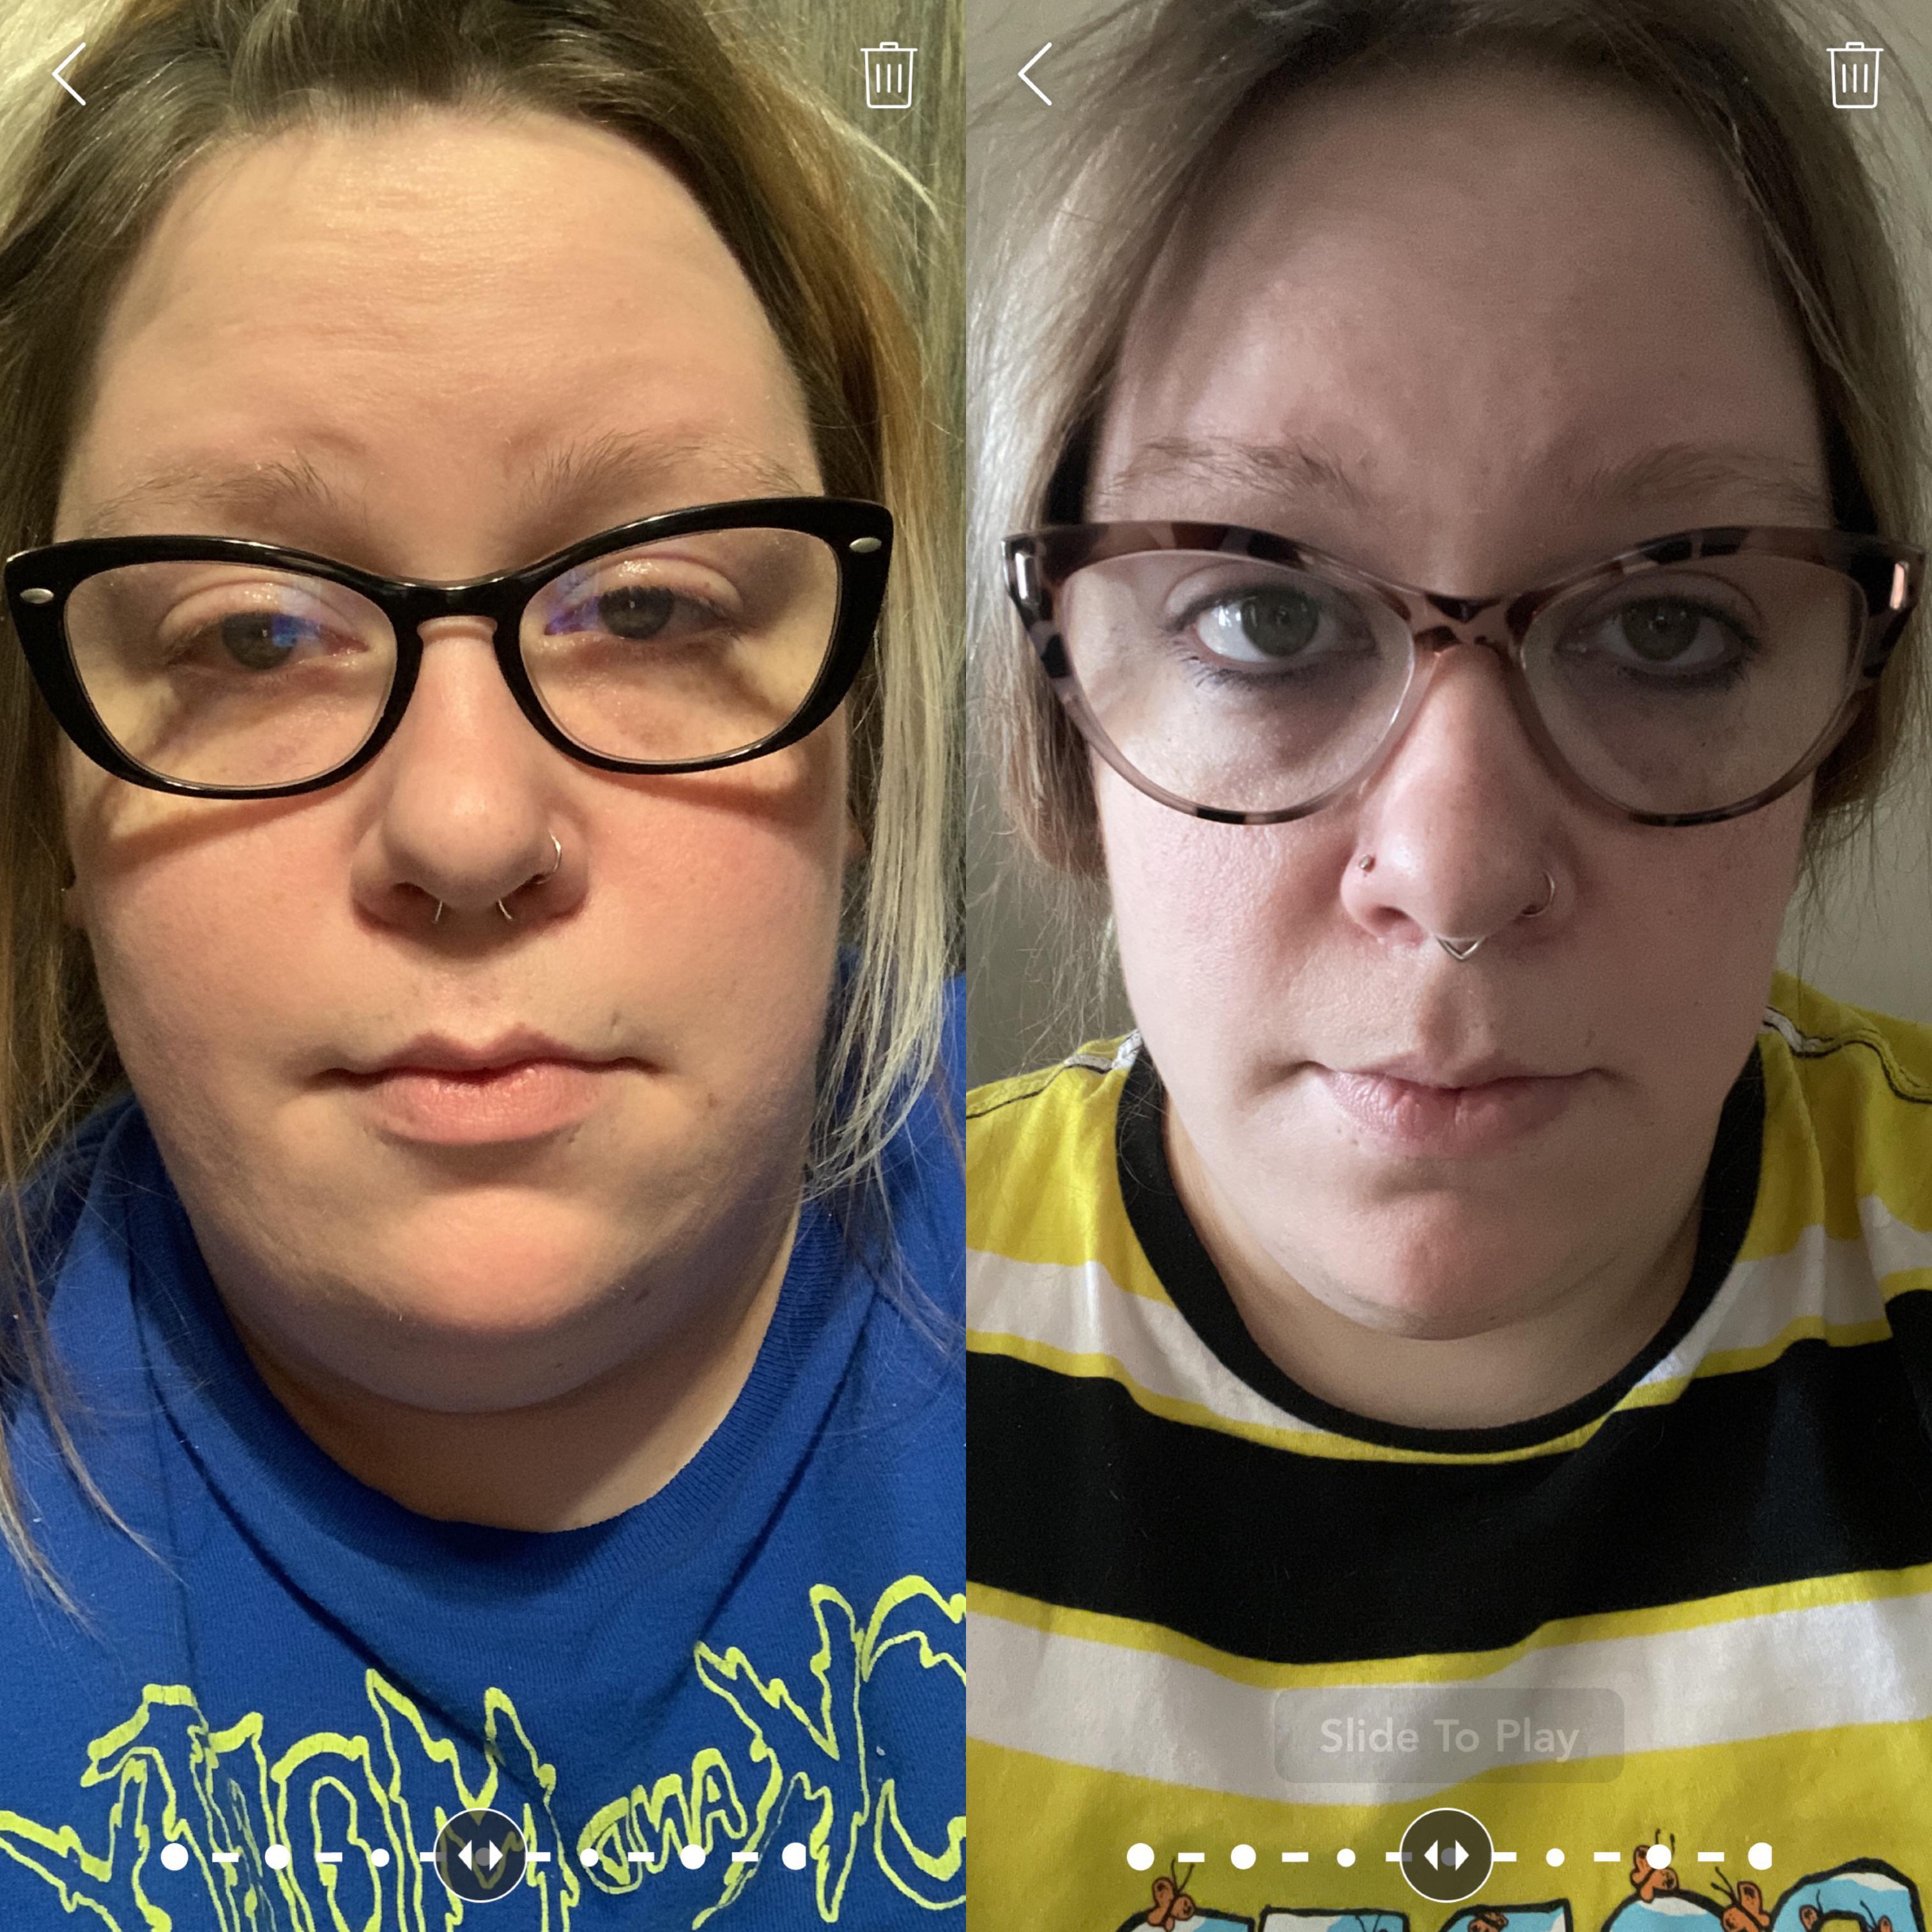 5'6 Female Progress Pics of 42 lbs Weight Loss 265 lbs to 223 lbs